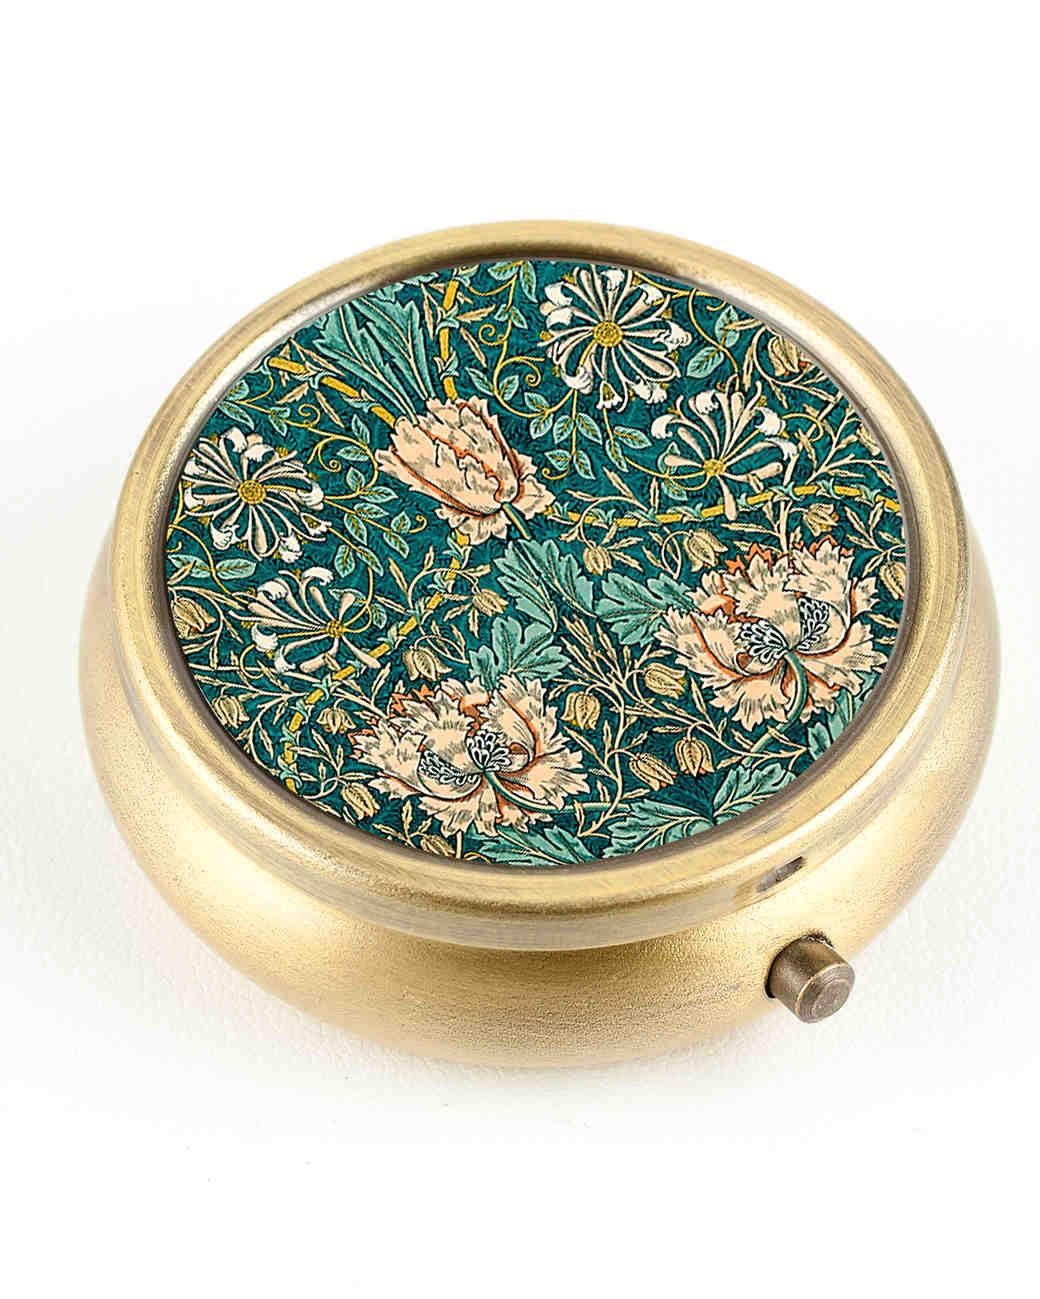 ring-boxes-decorative-design-pill-box-0115.jpg